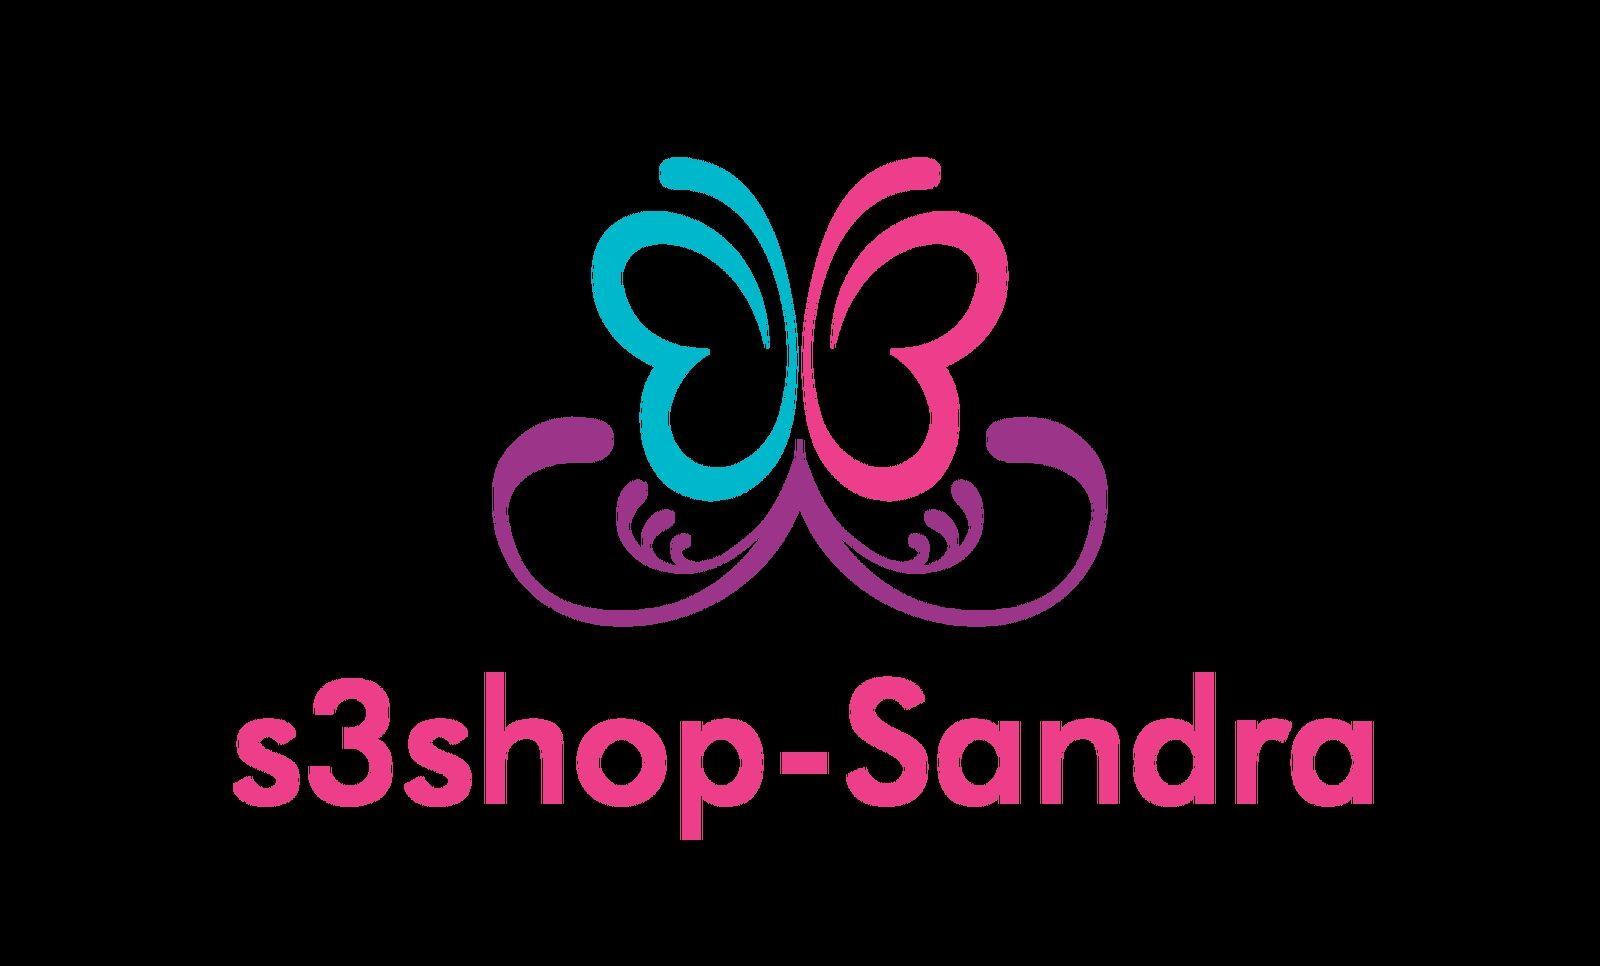 s3shop-sandra